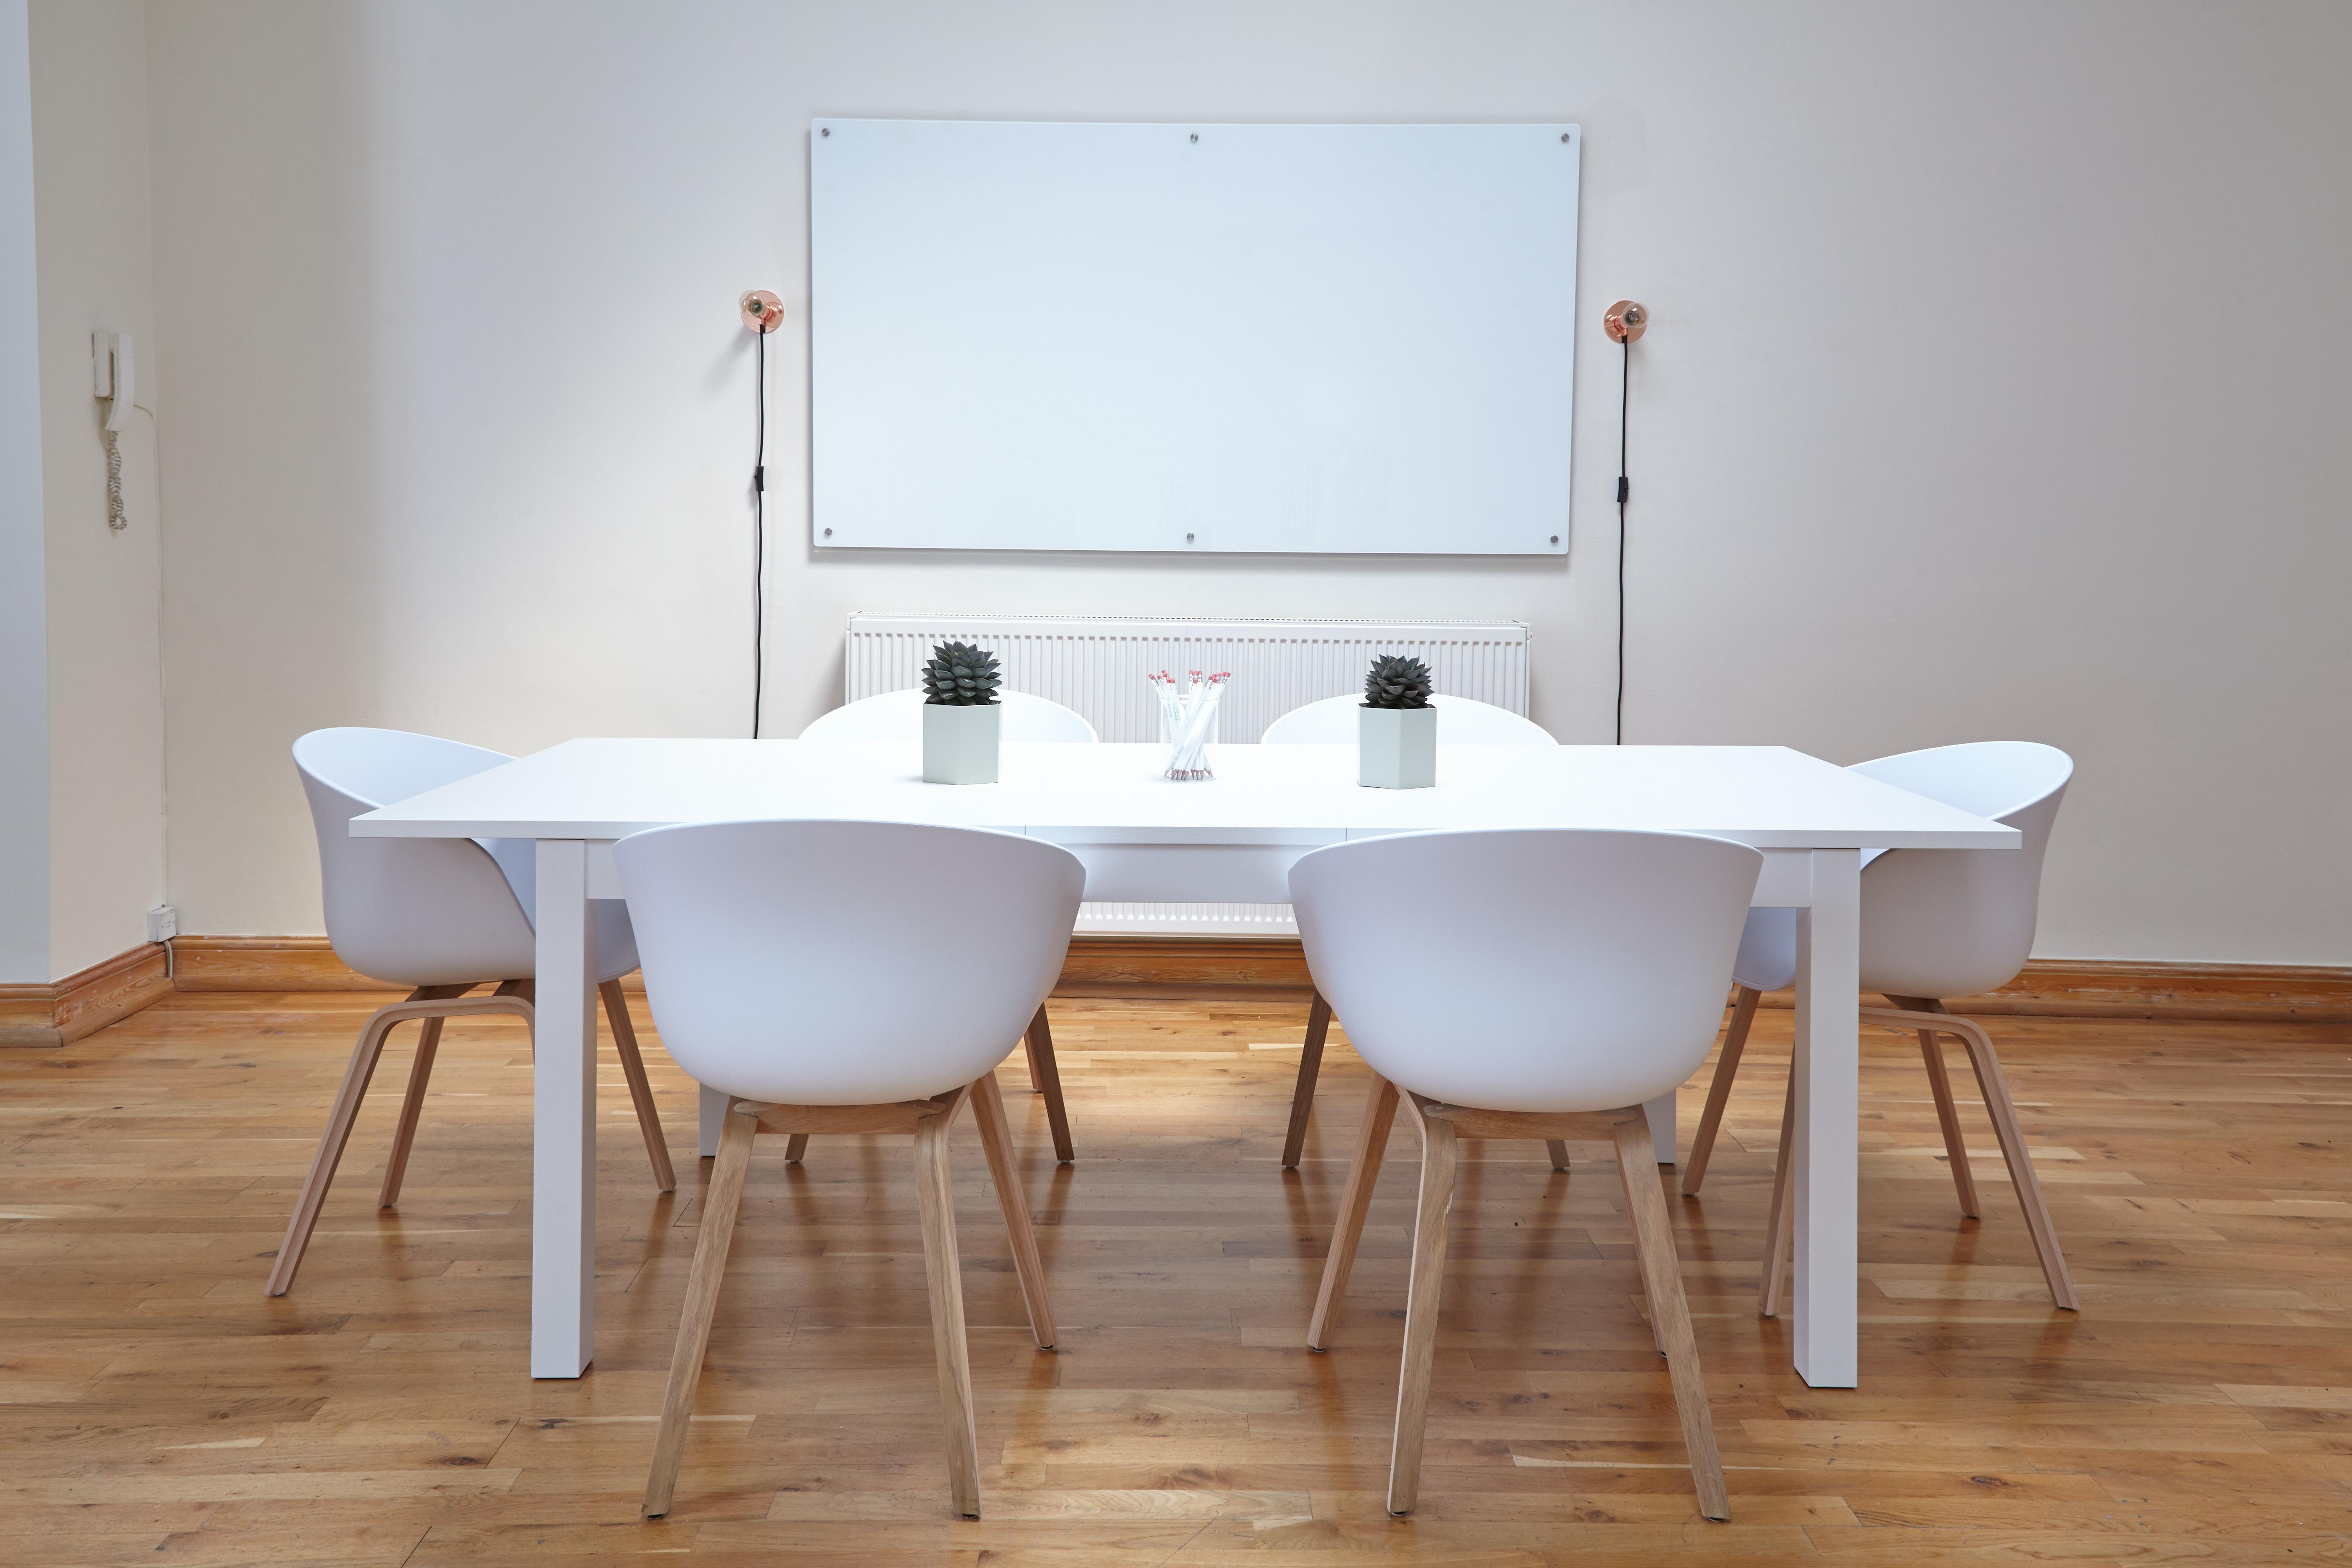 Table Wood Chair Floor Sink Furniture Room Work Space Office Meeting Interior Design